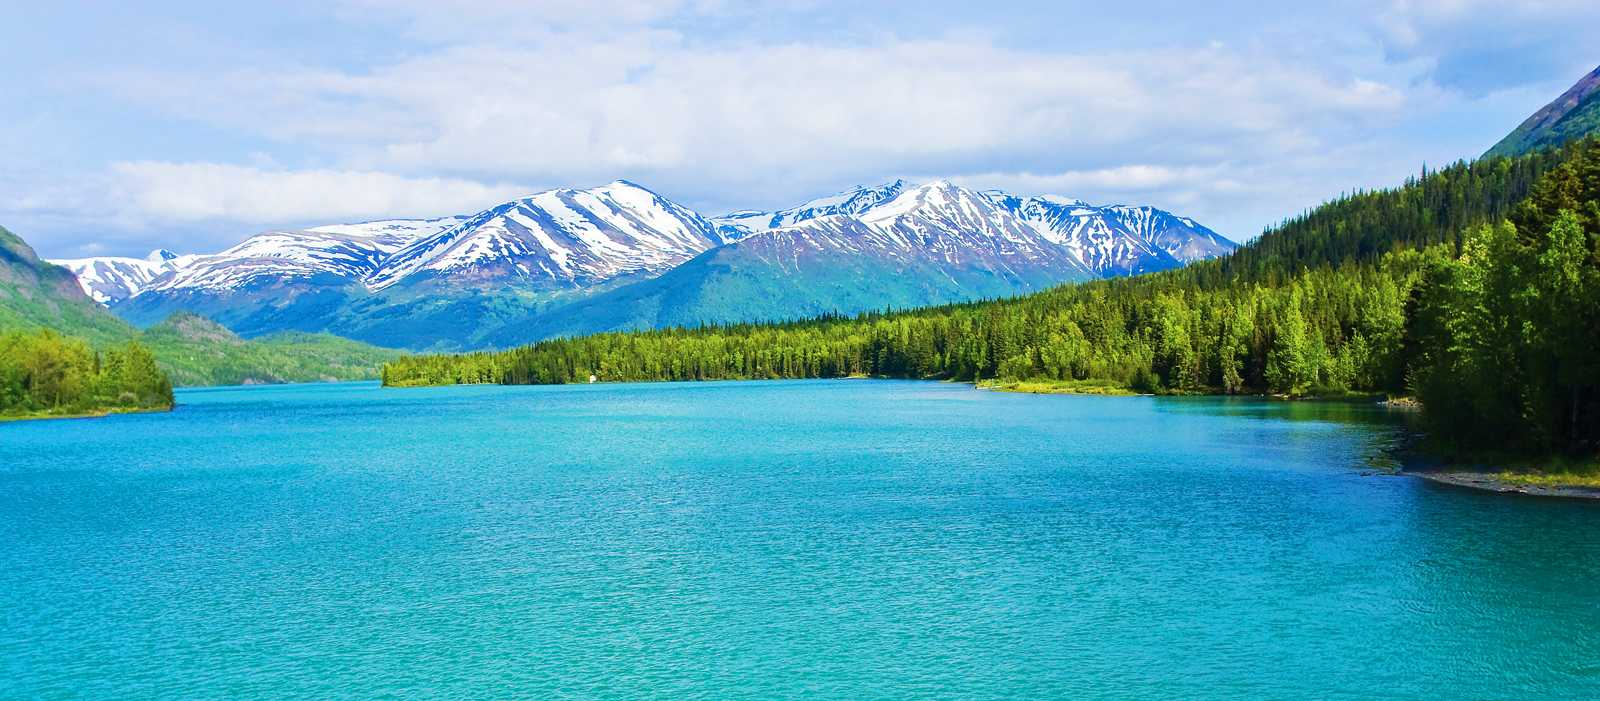 Alaska, Flyfishing, Kenai Peninsula, Kenai River, guided drift boat fishing on upper Kenai River, MR